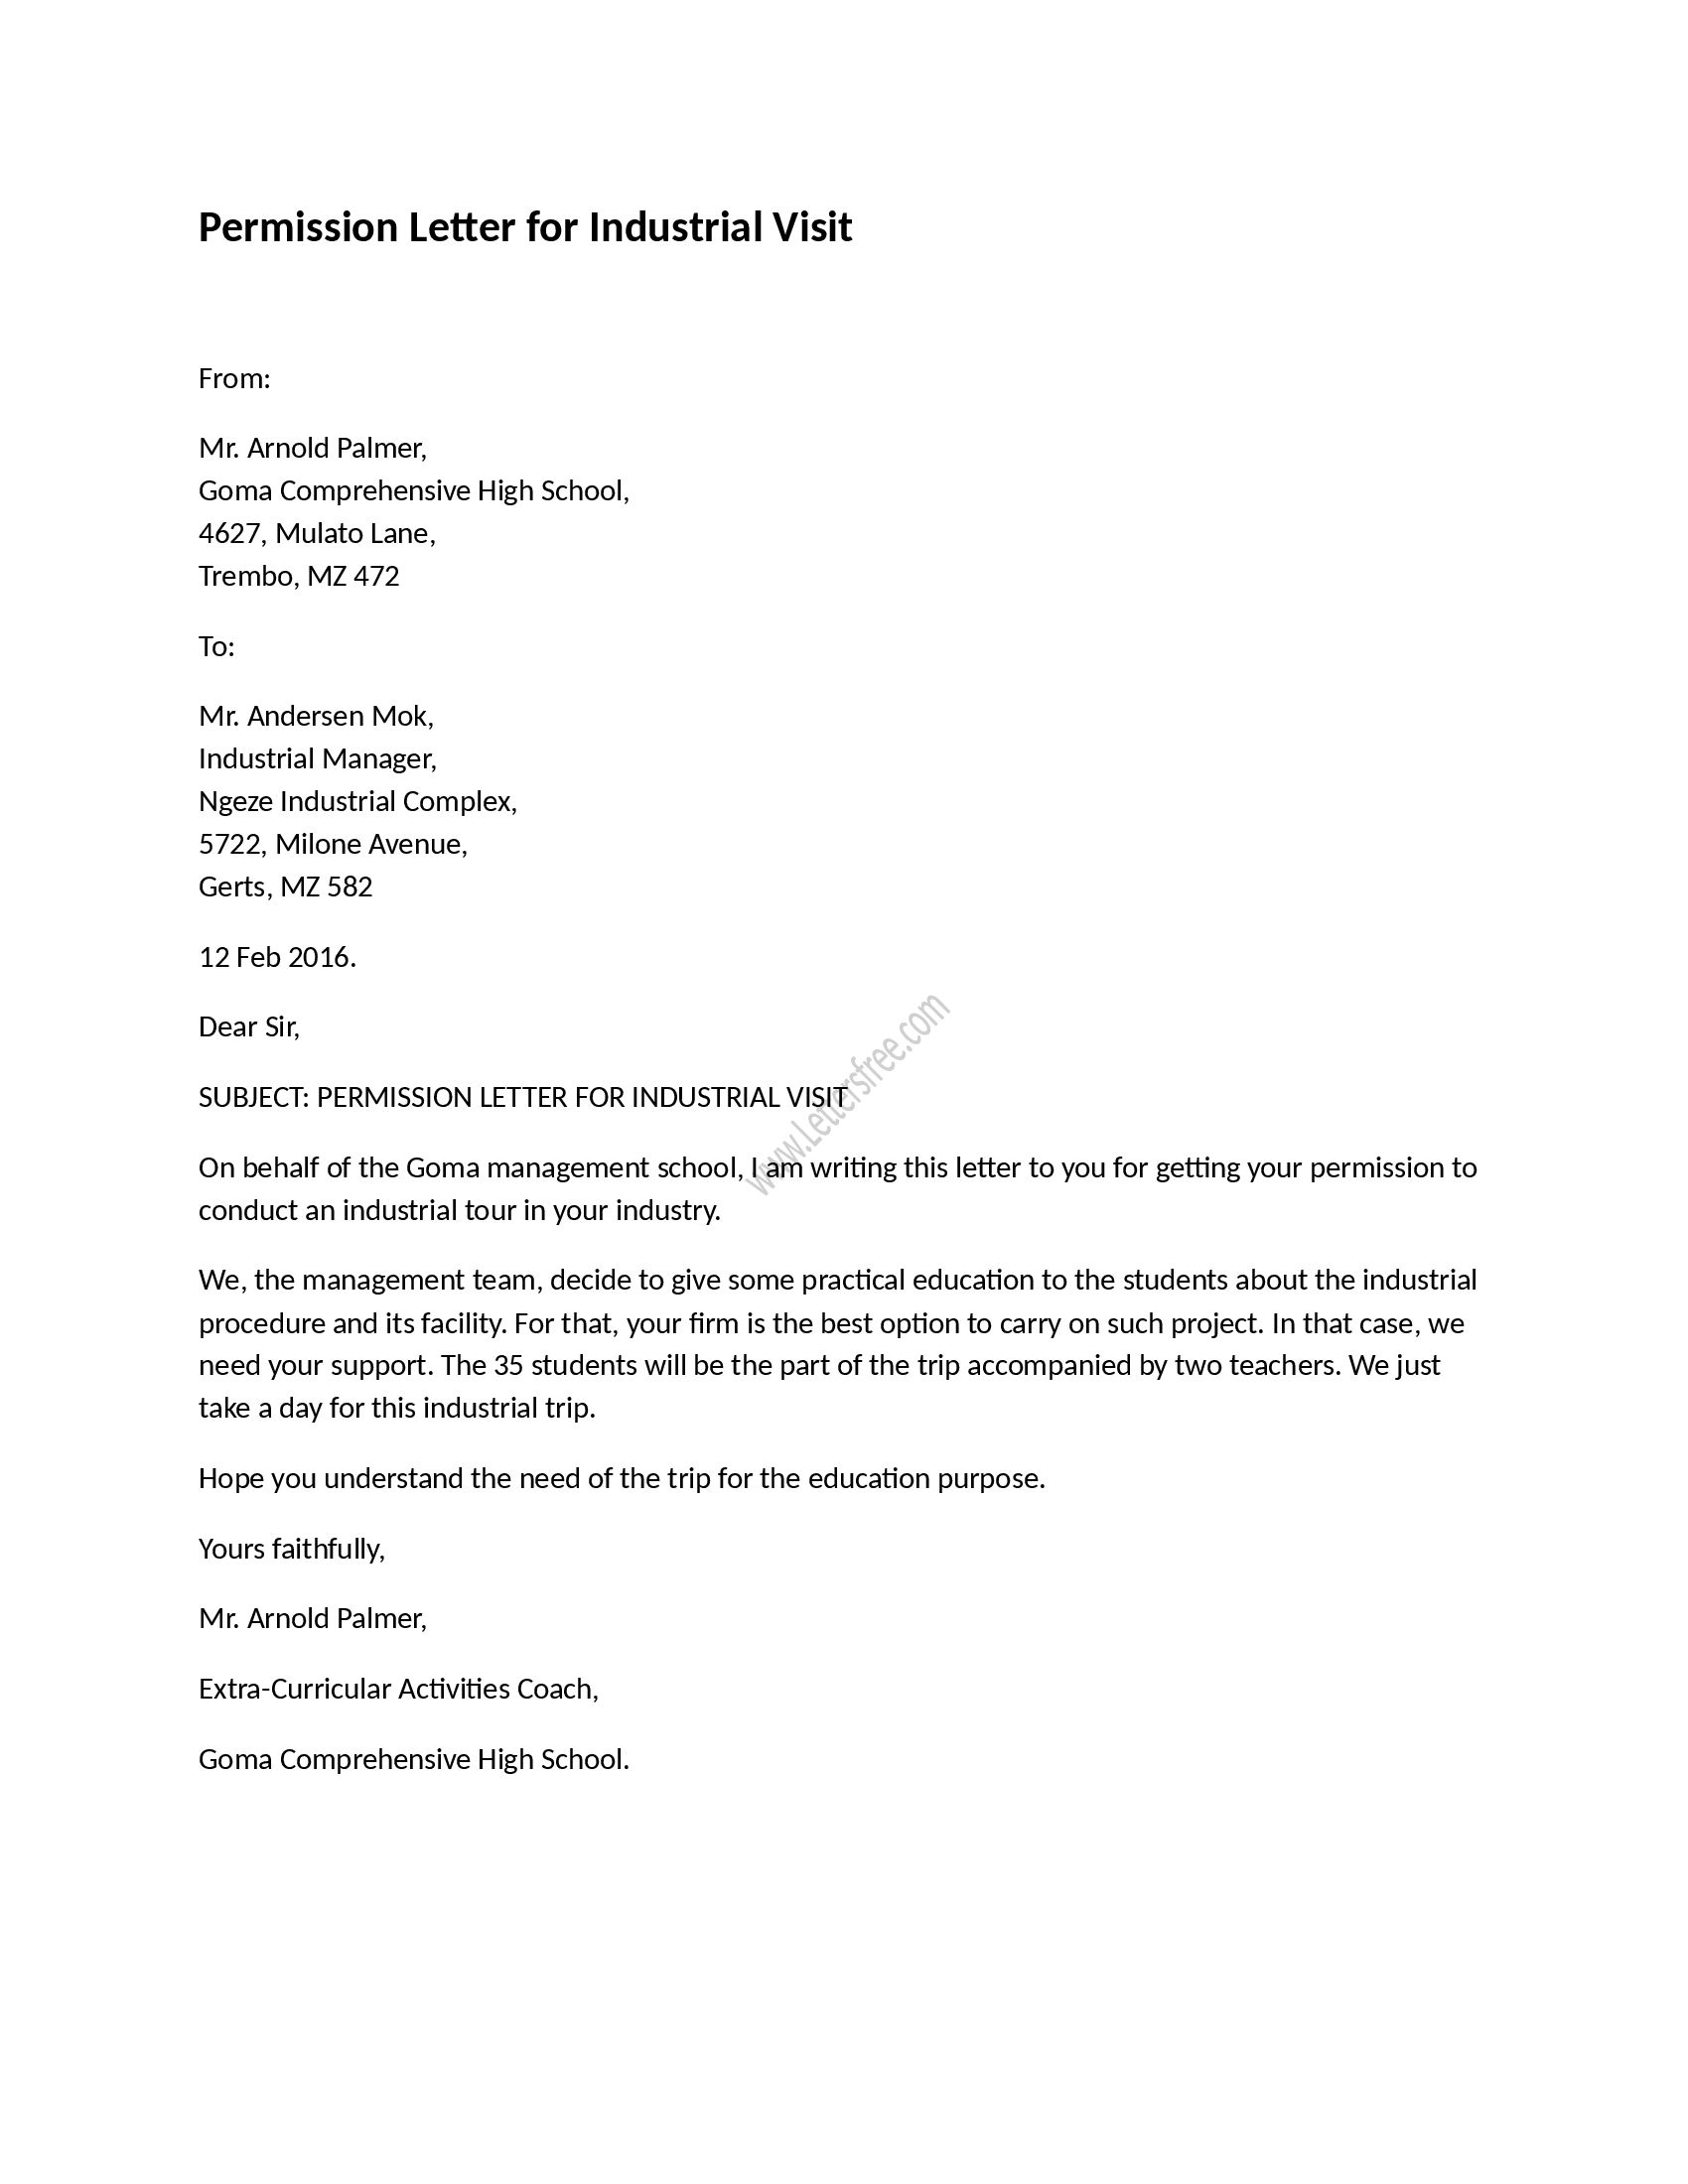 Permission Letter for Industrial Visit Lettering